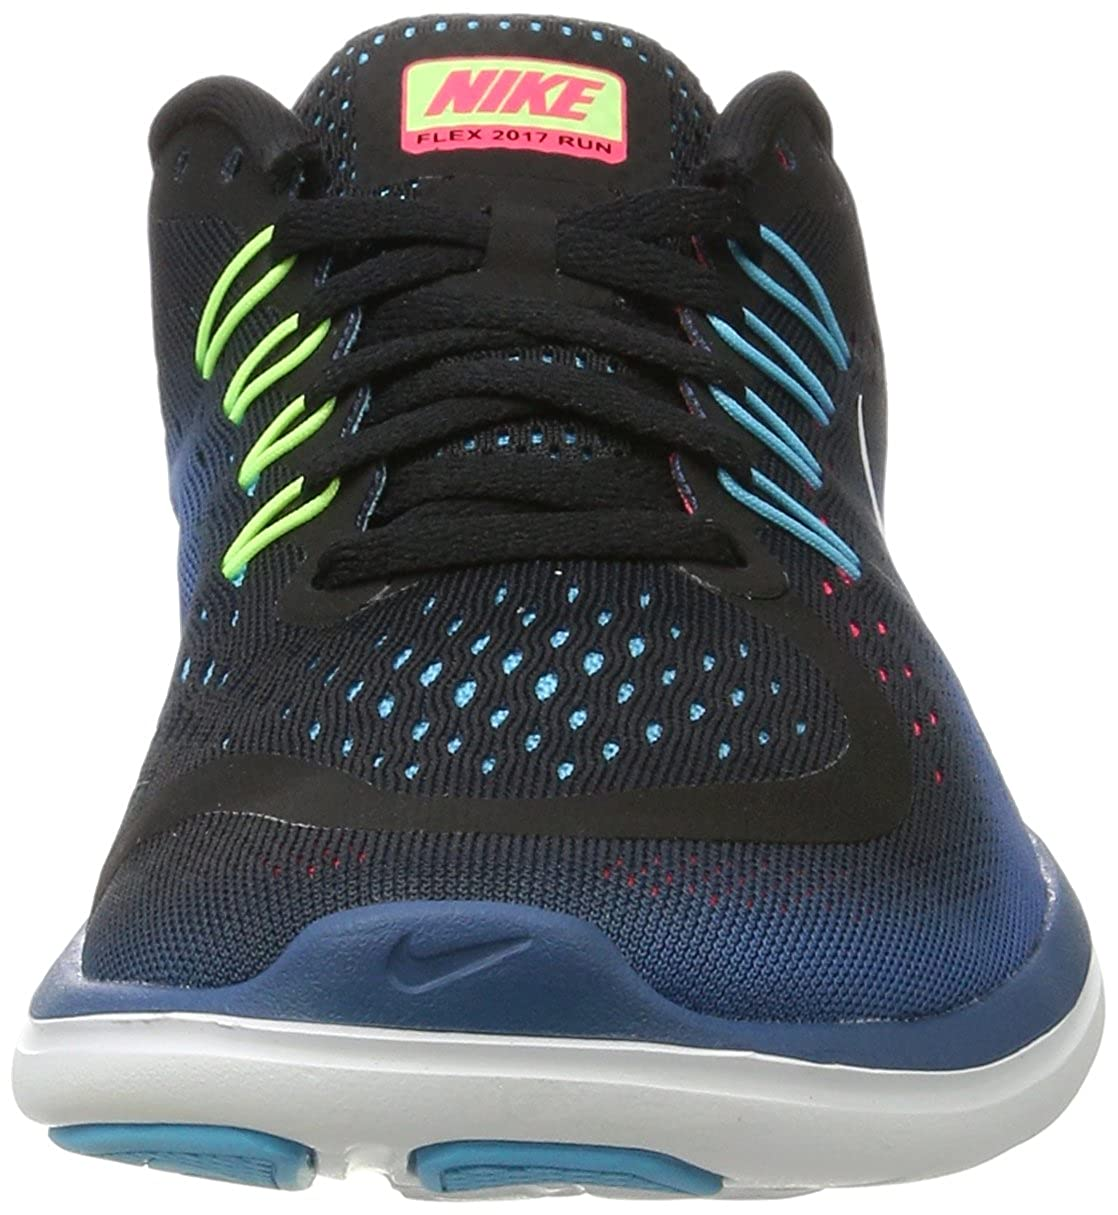 Sense Free Rn Running Shoe Nike Women's 3RLAq45j